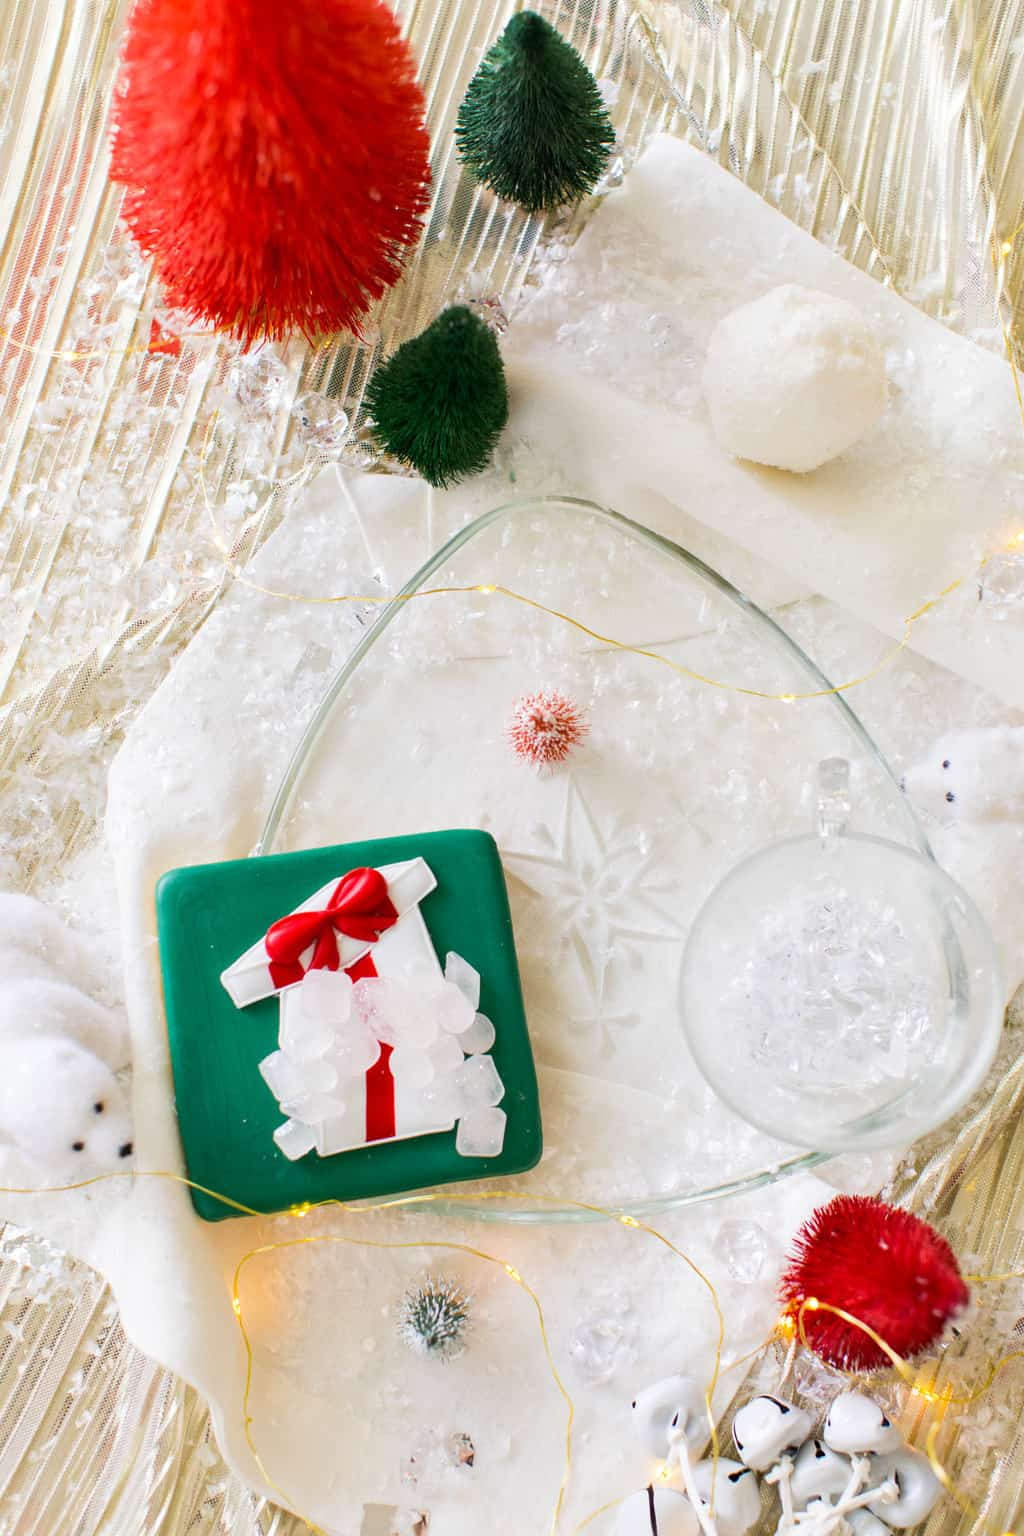 an icy silver Christmas decor by Ashley Rose of Sugar & Cloth